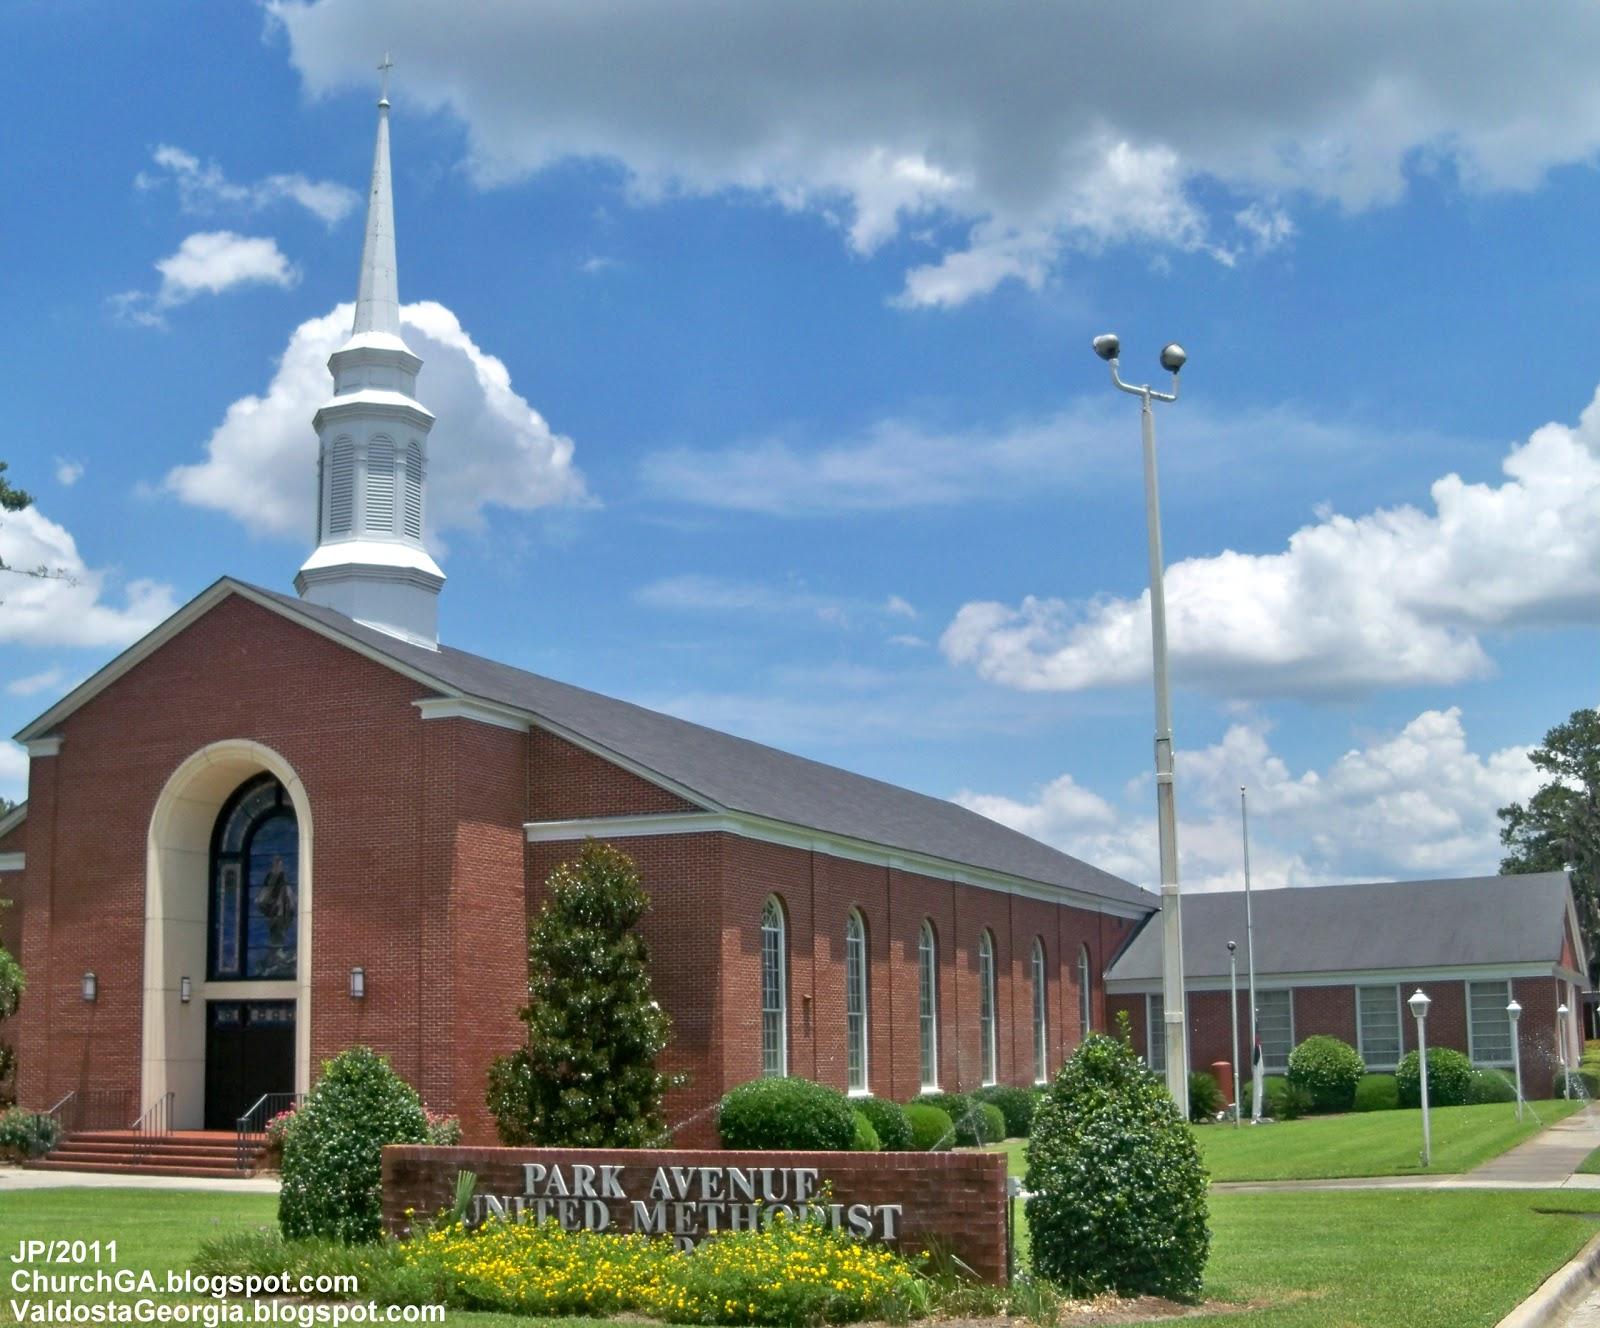 Methodist churches park avenue united methodist church valdosta